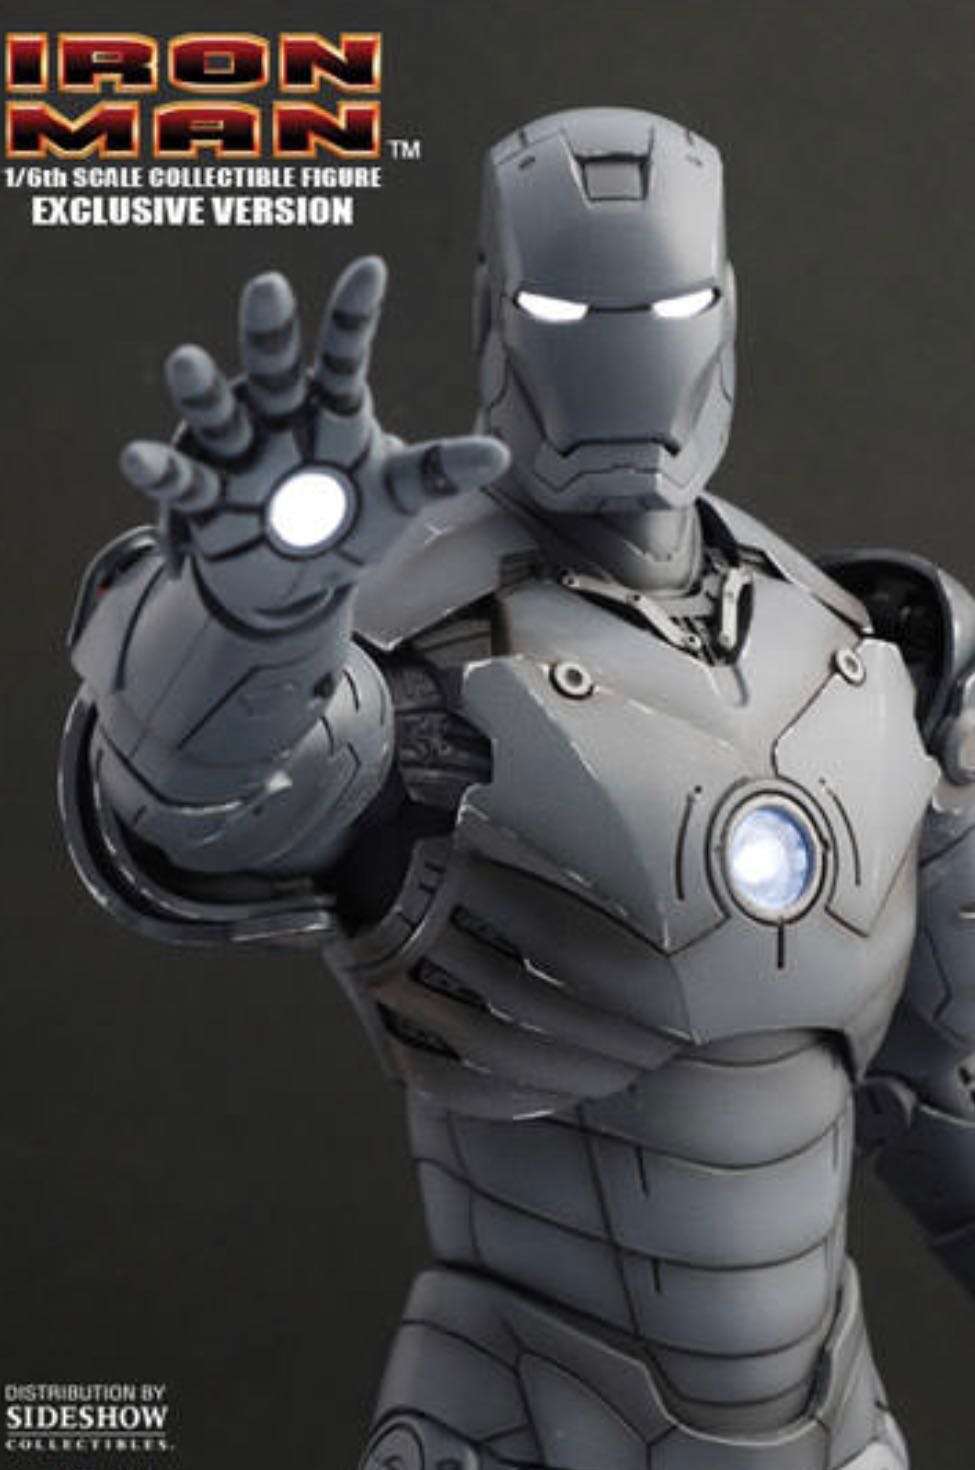 Hot Toys Mms 101 Iron Man Mark Iii Gunmetal Toys Games Bricks